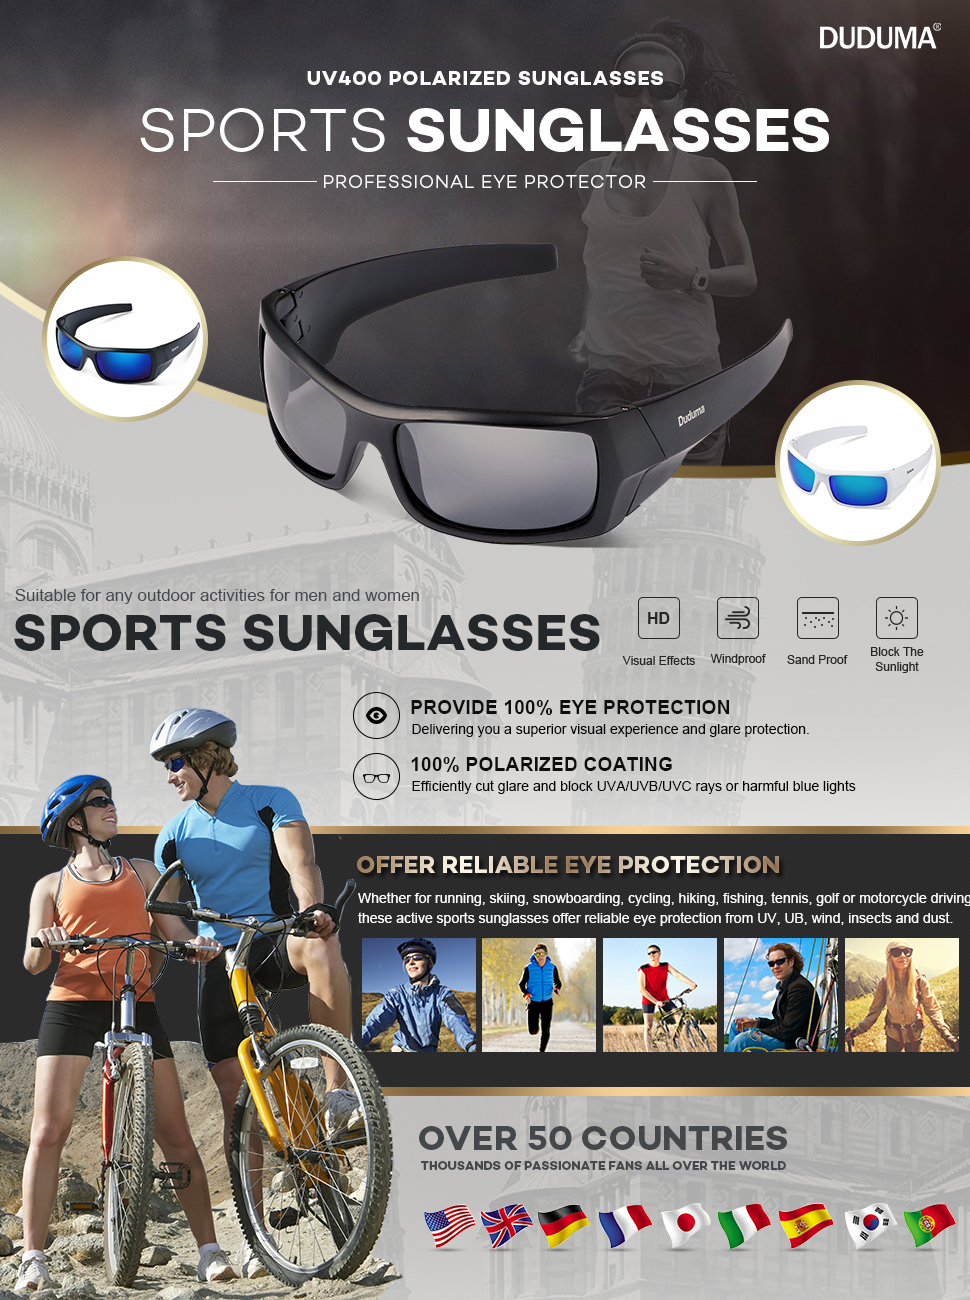 ef934a20afe Duduma Tr601 Polarized Sports Sunglasses for Baseball Cycling ...